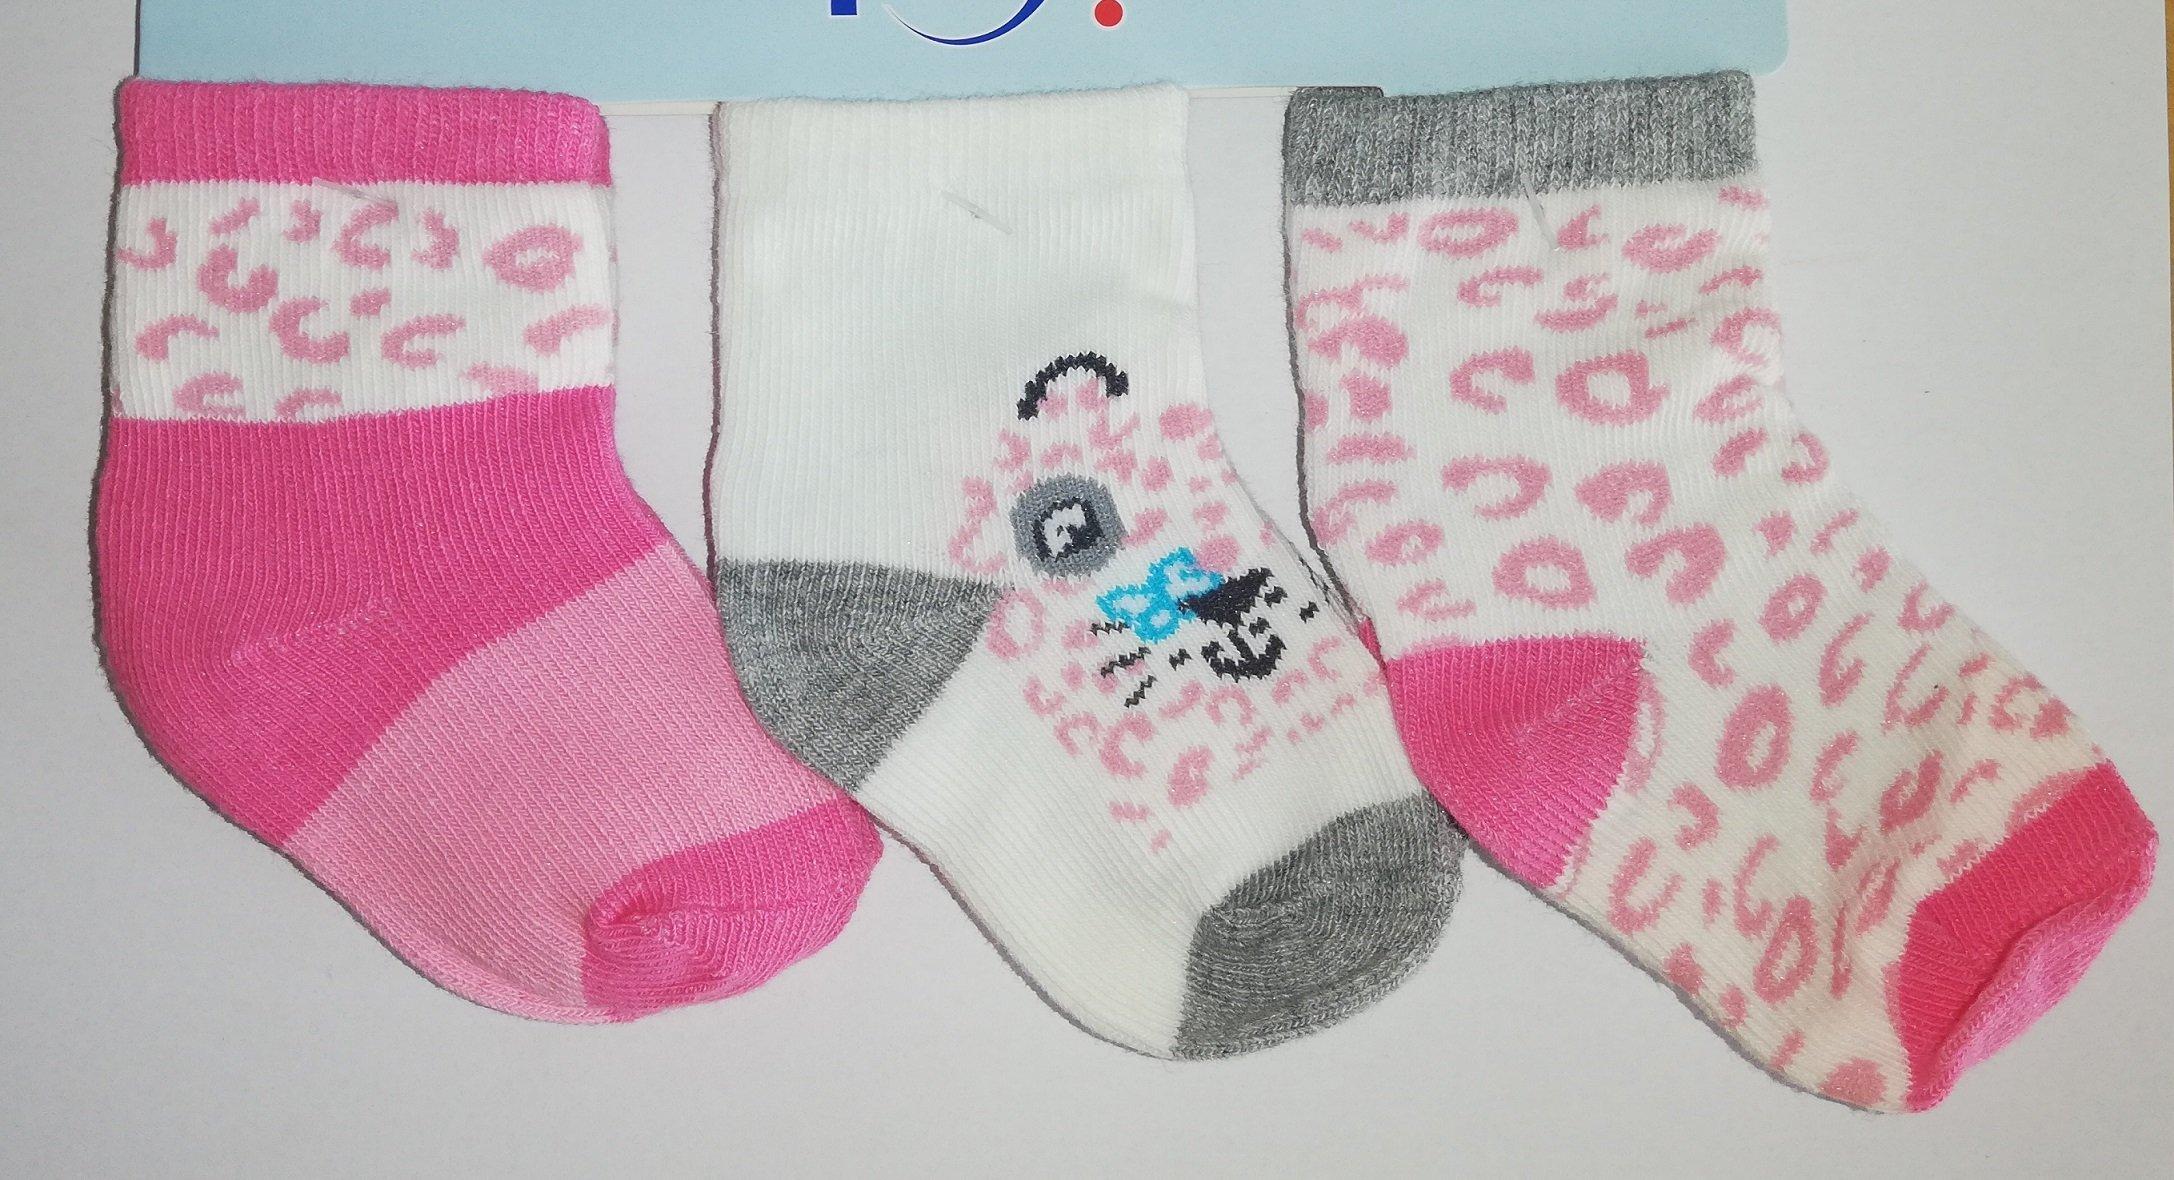 Pono�ky kojeneck� 3 p�ry v balen� 6-9m barevn� holka pejsek - zv��i� obr�zok